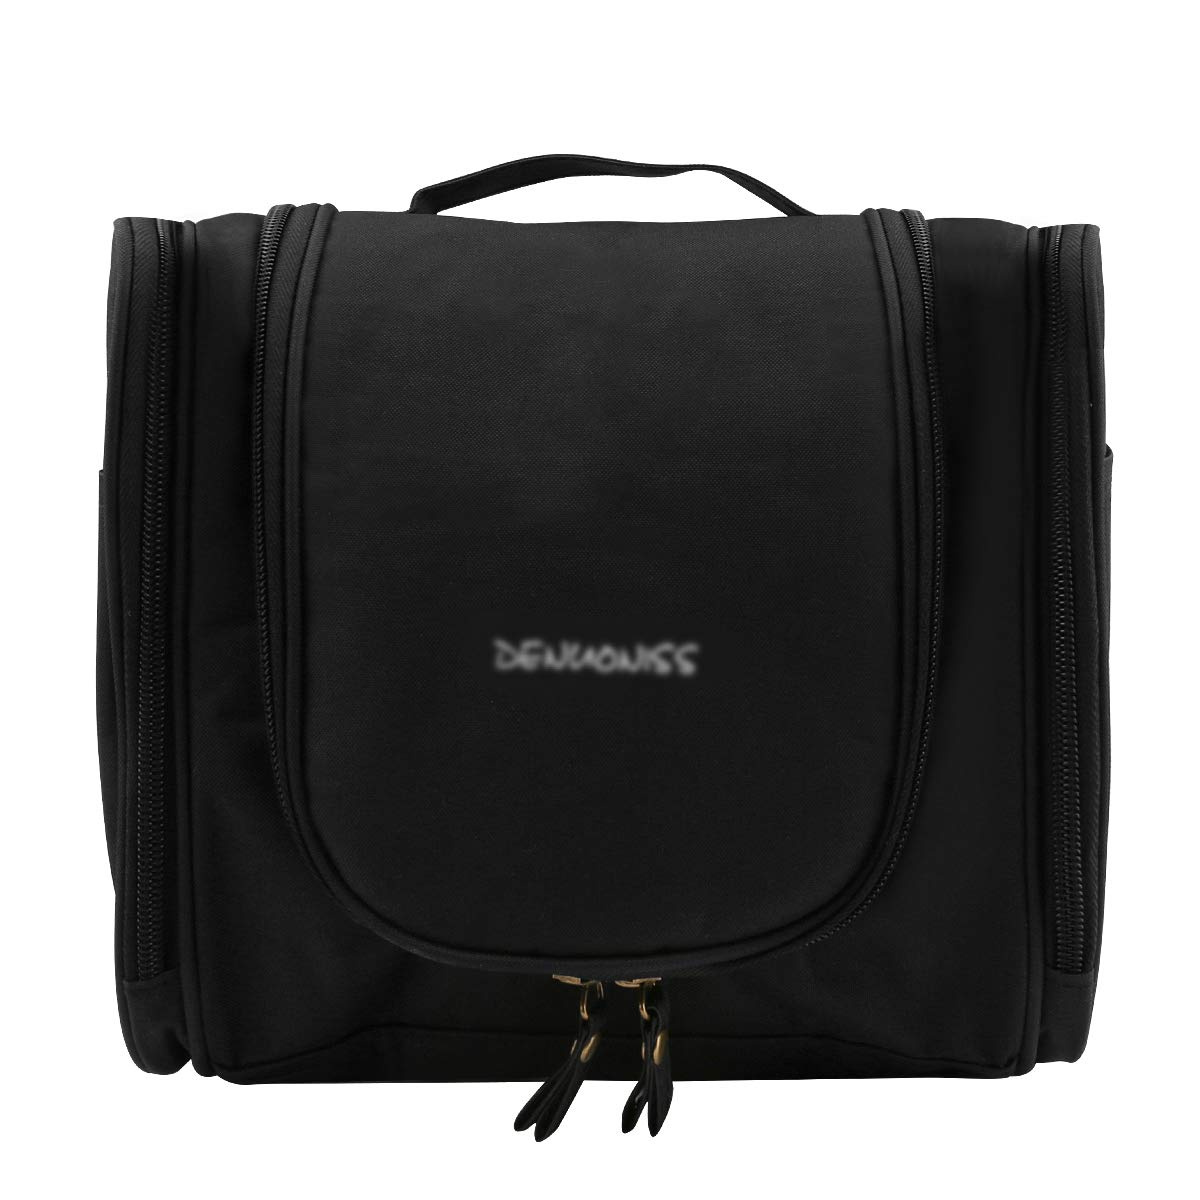 59d5653050 Travel Toiletry Bag